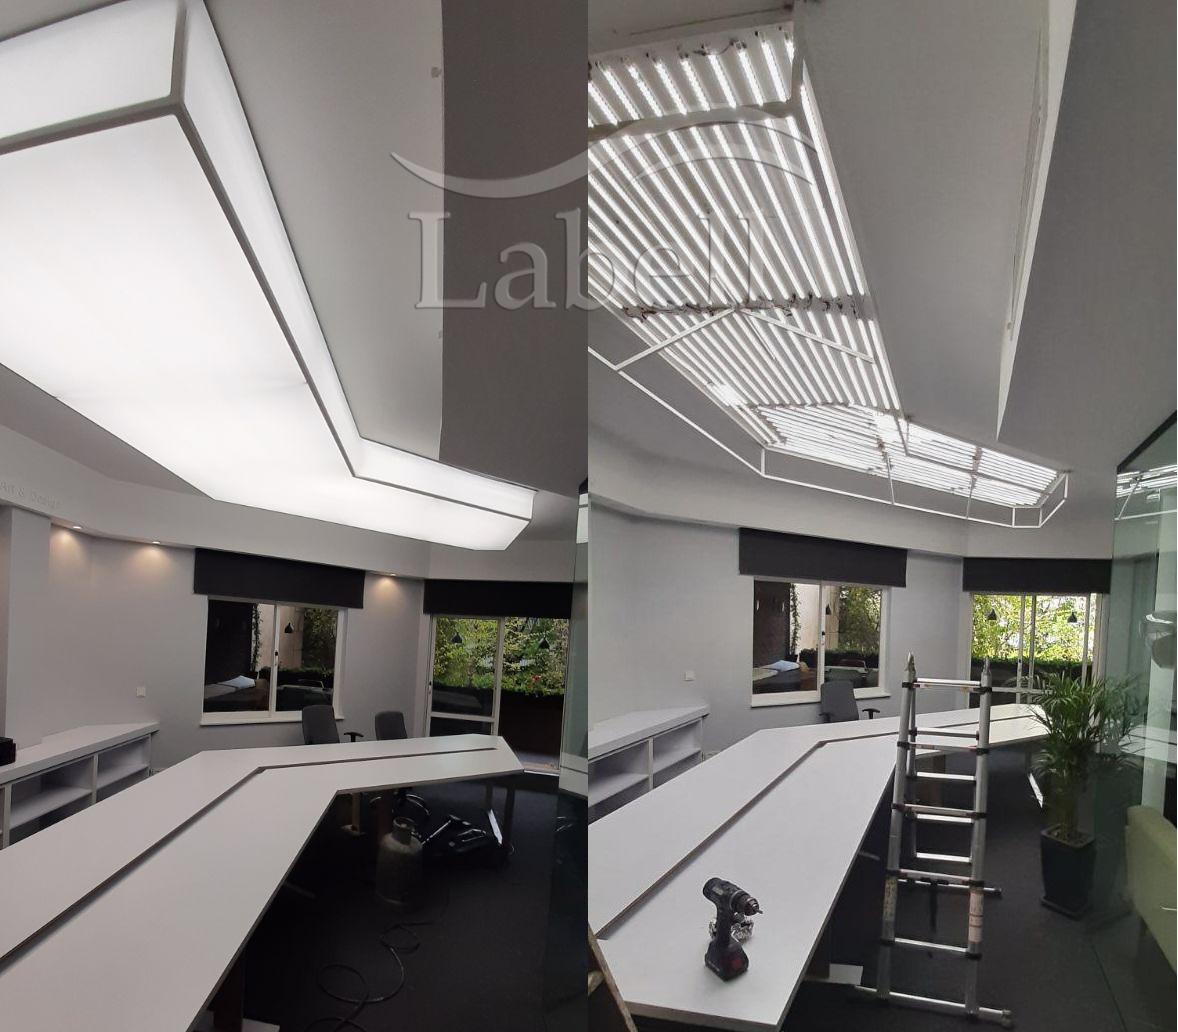 led لنز دار روشنایی سقف کشسان